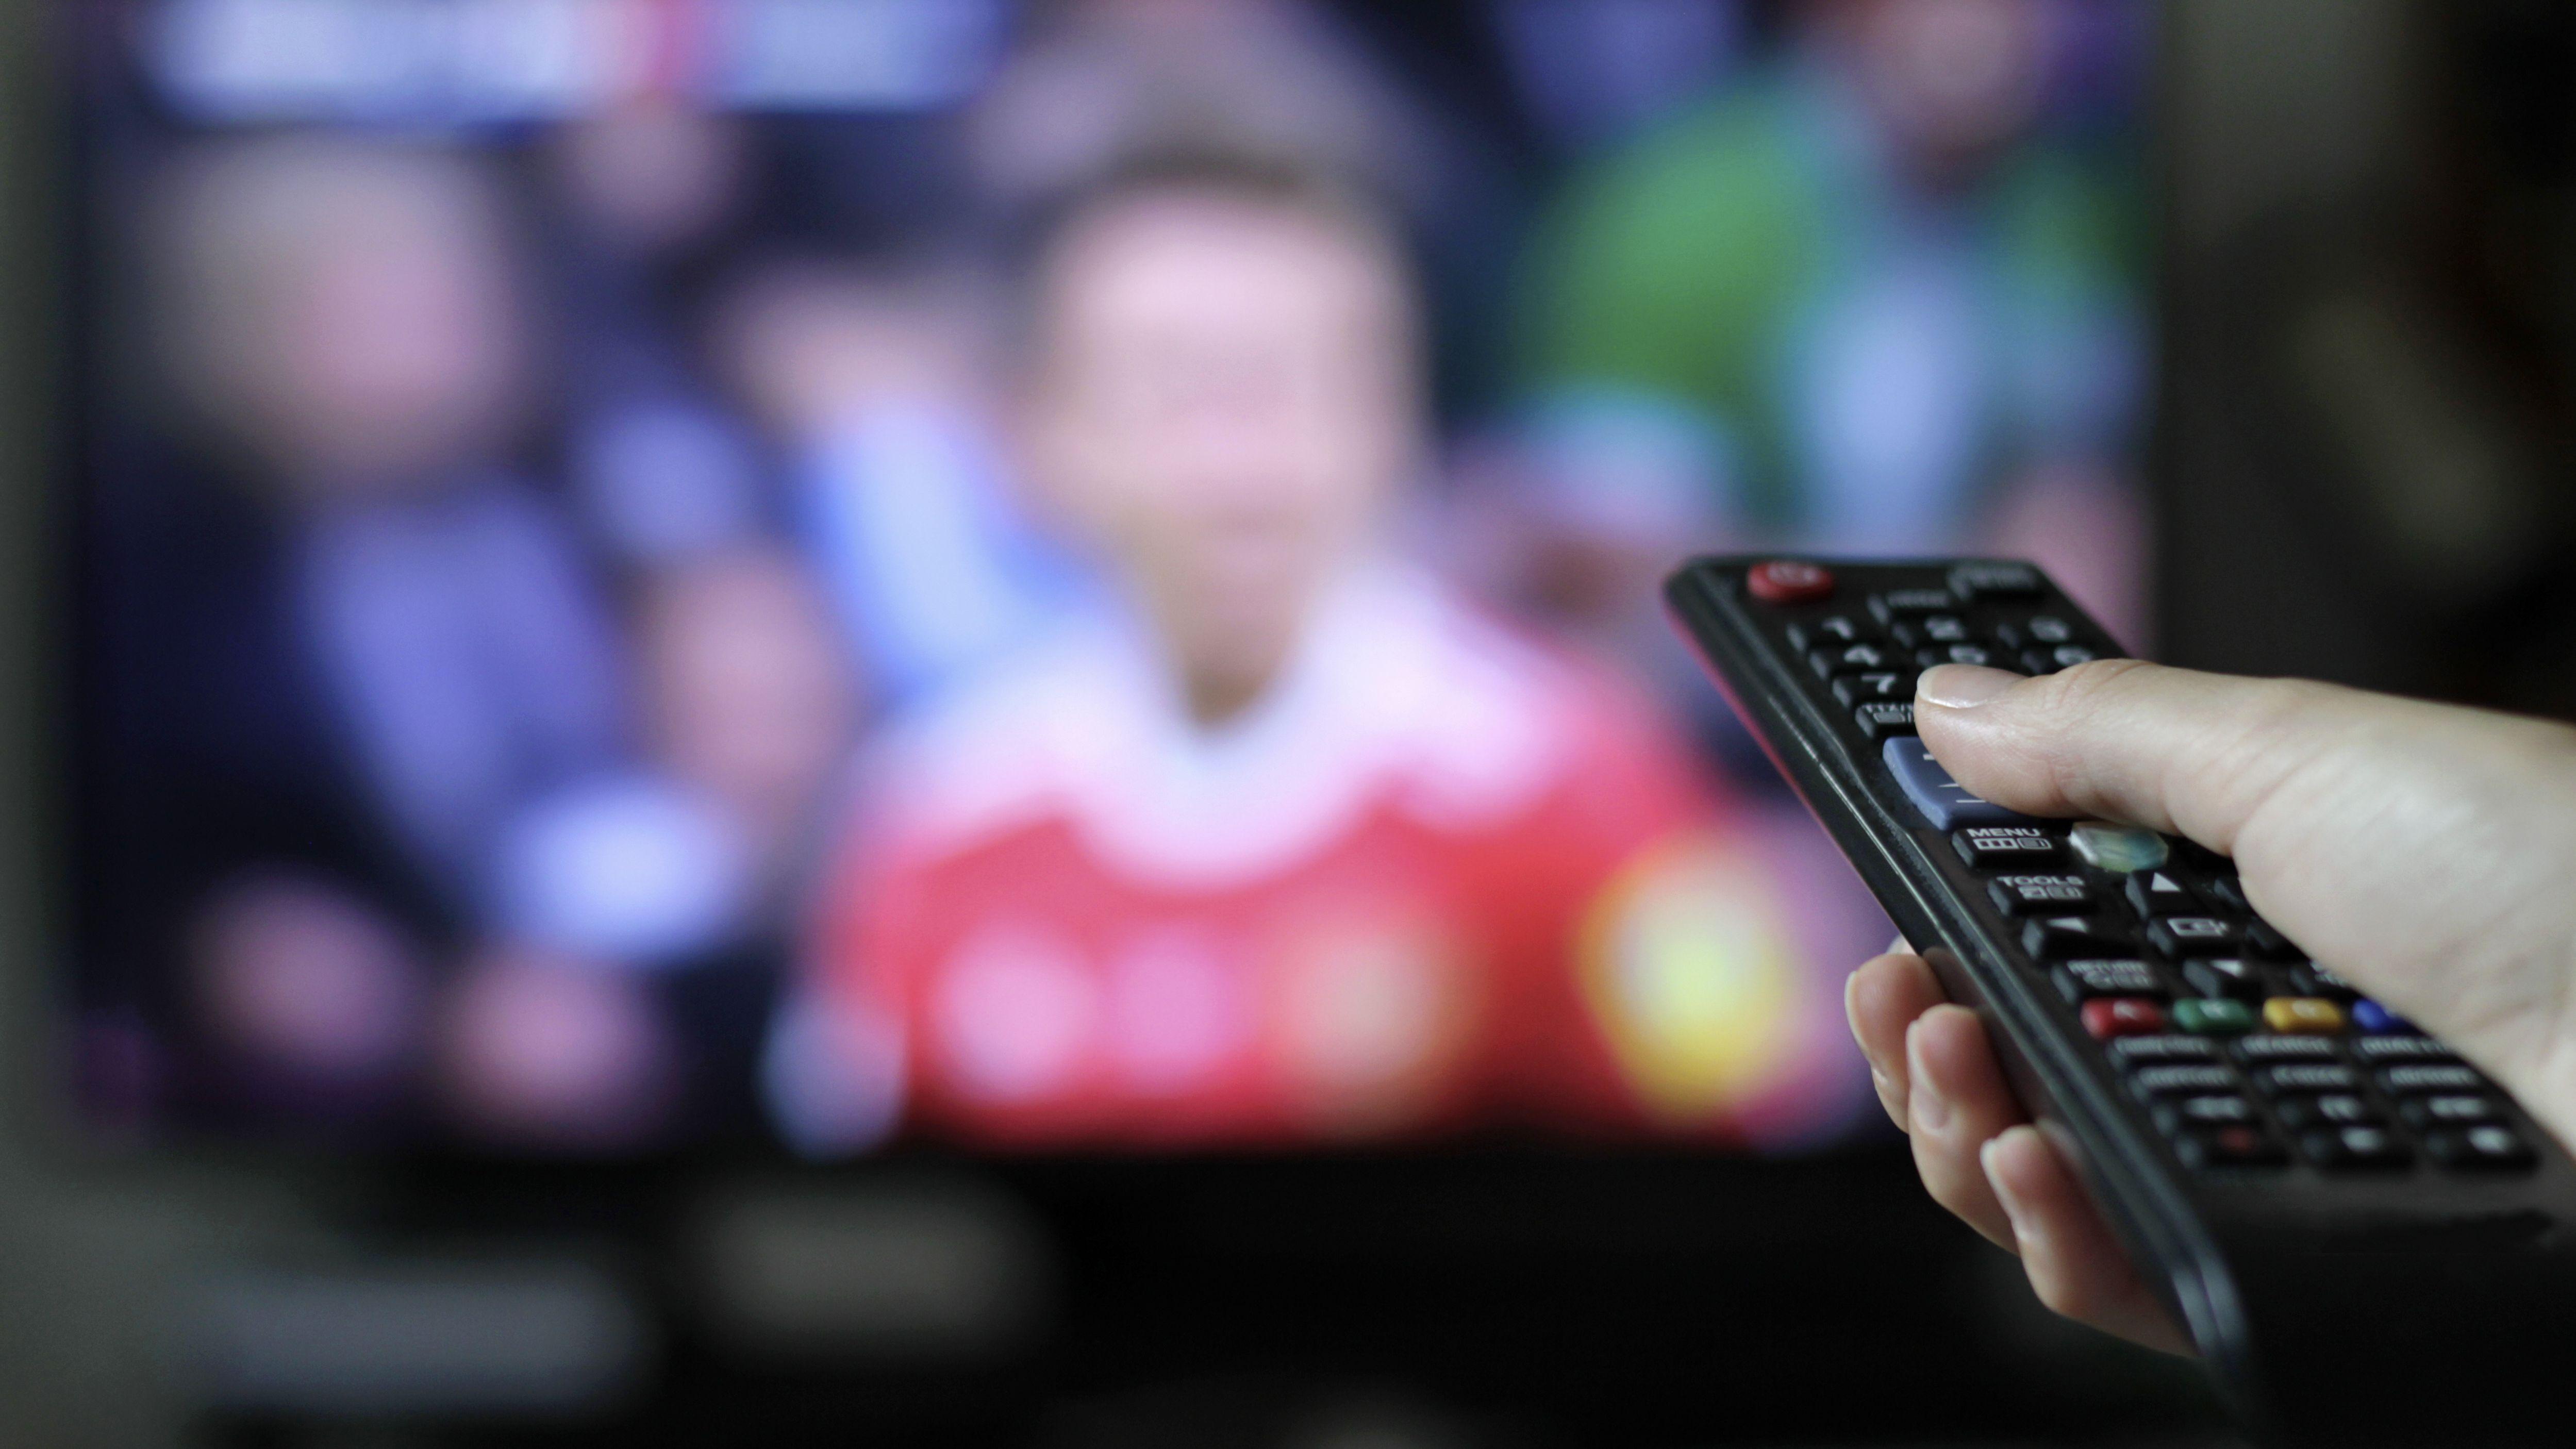 Carat-Studie: So ticken die Bundesliga-Fans